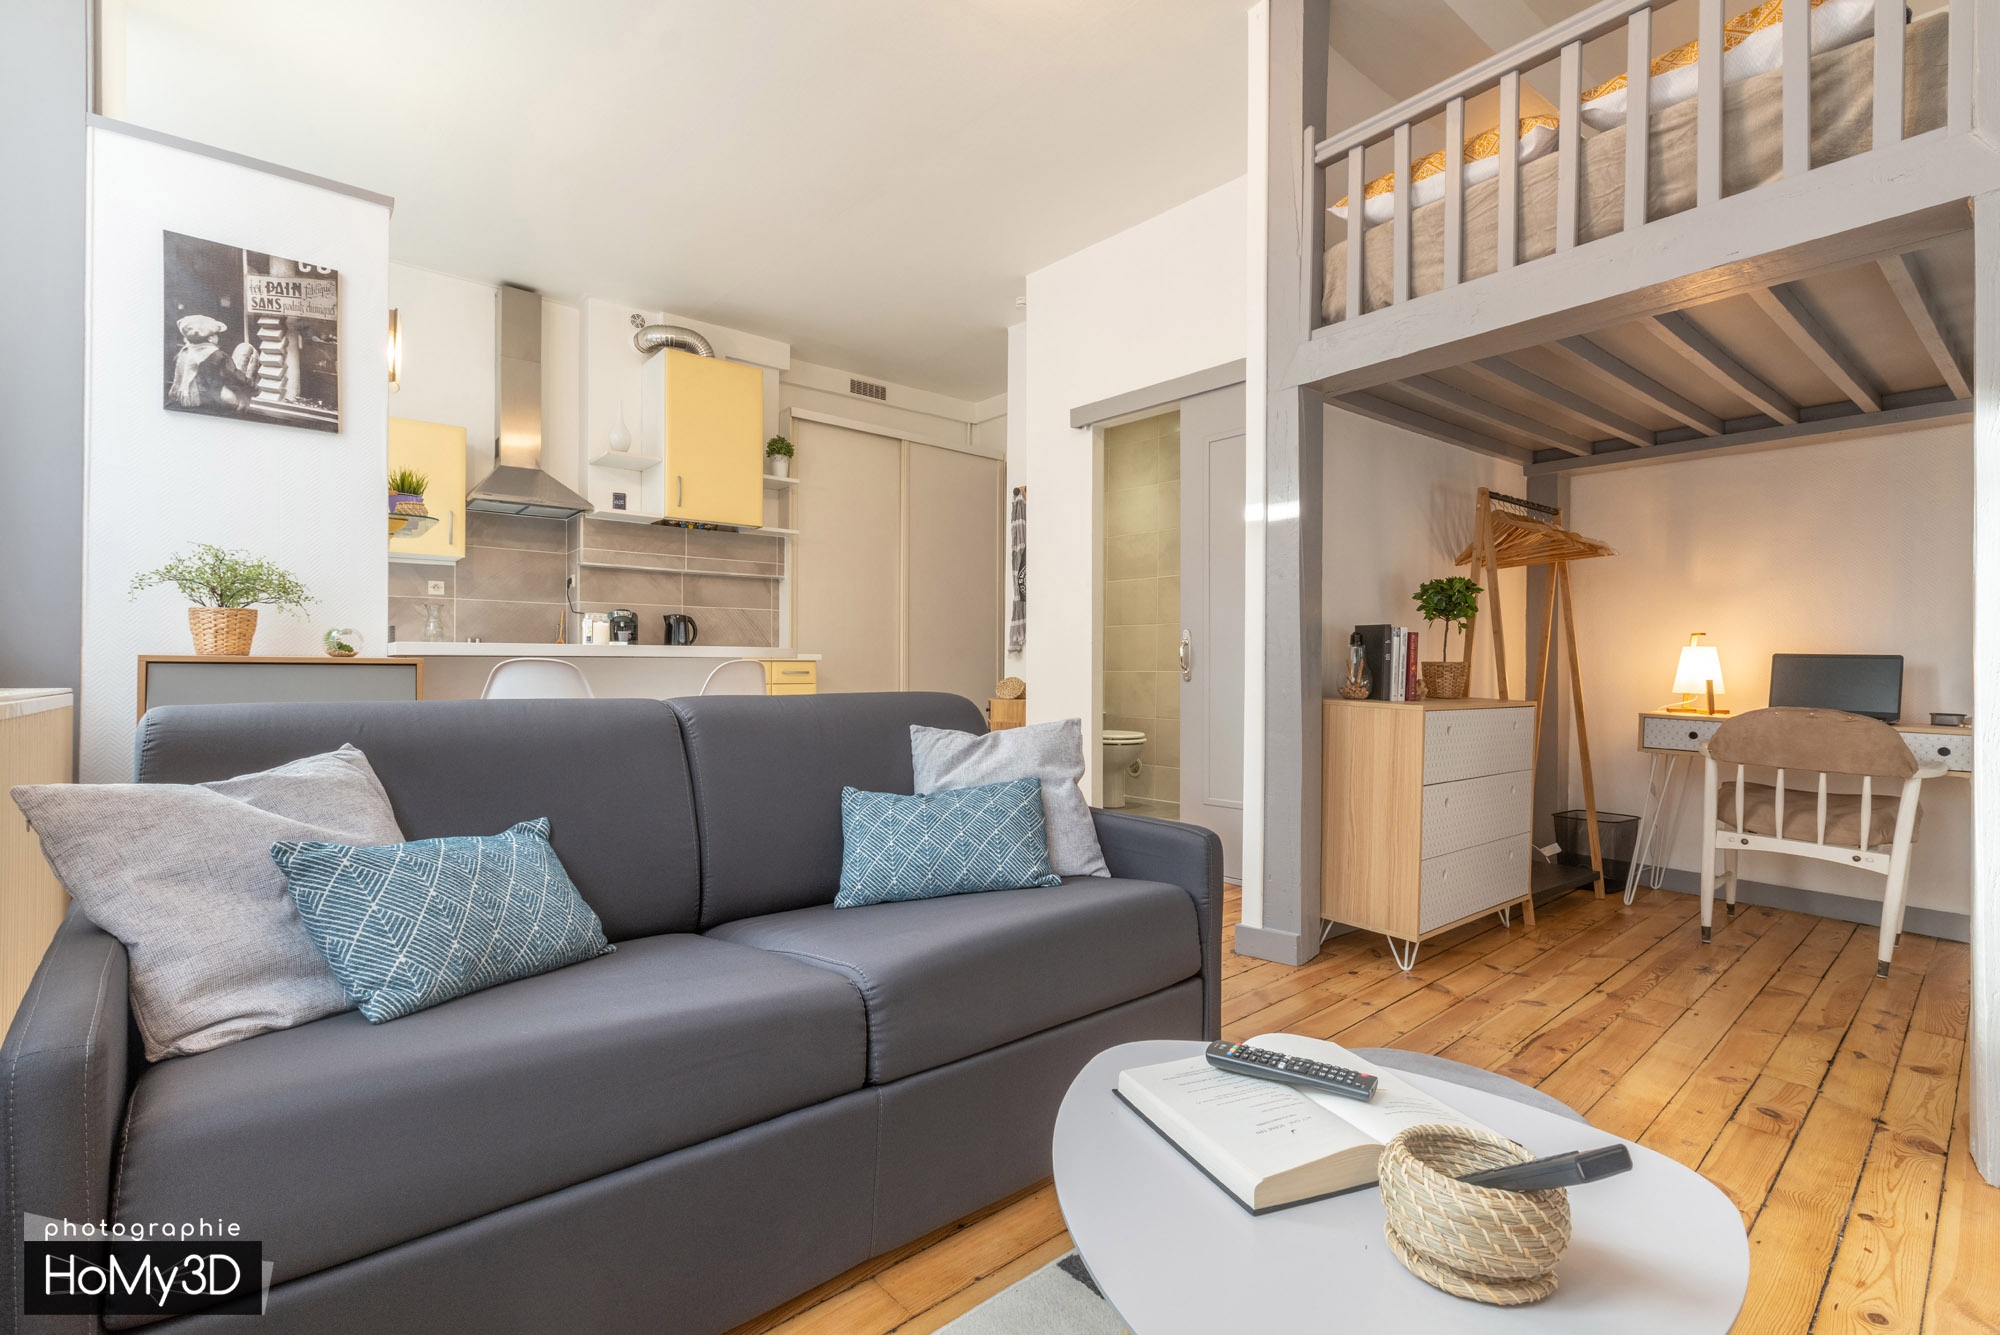 appartement-st-etienne-salon-mezzanine